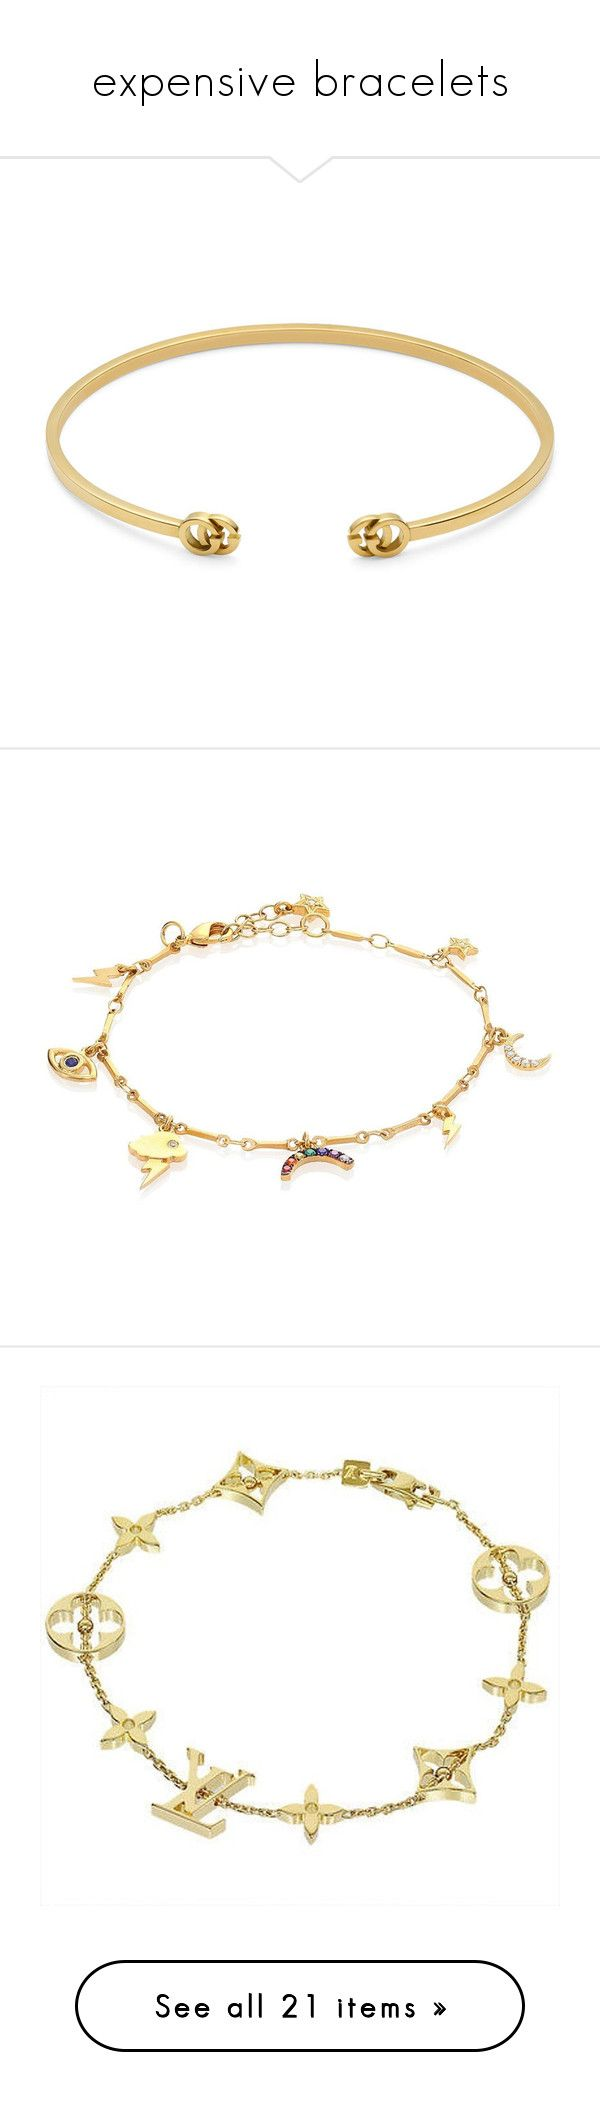 """expensive bracelets"" by mrstomlinson974 on Polyvore featuring jewelry, bracelets, accessories, braccialetti, 18k gold jewelry, gucci jewellery, 18k gold bangles, yellow gold cuff bracelet, gold cuff bangle and charm jewelry"